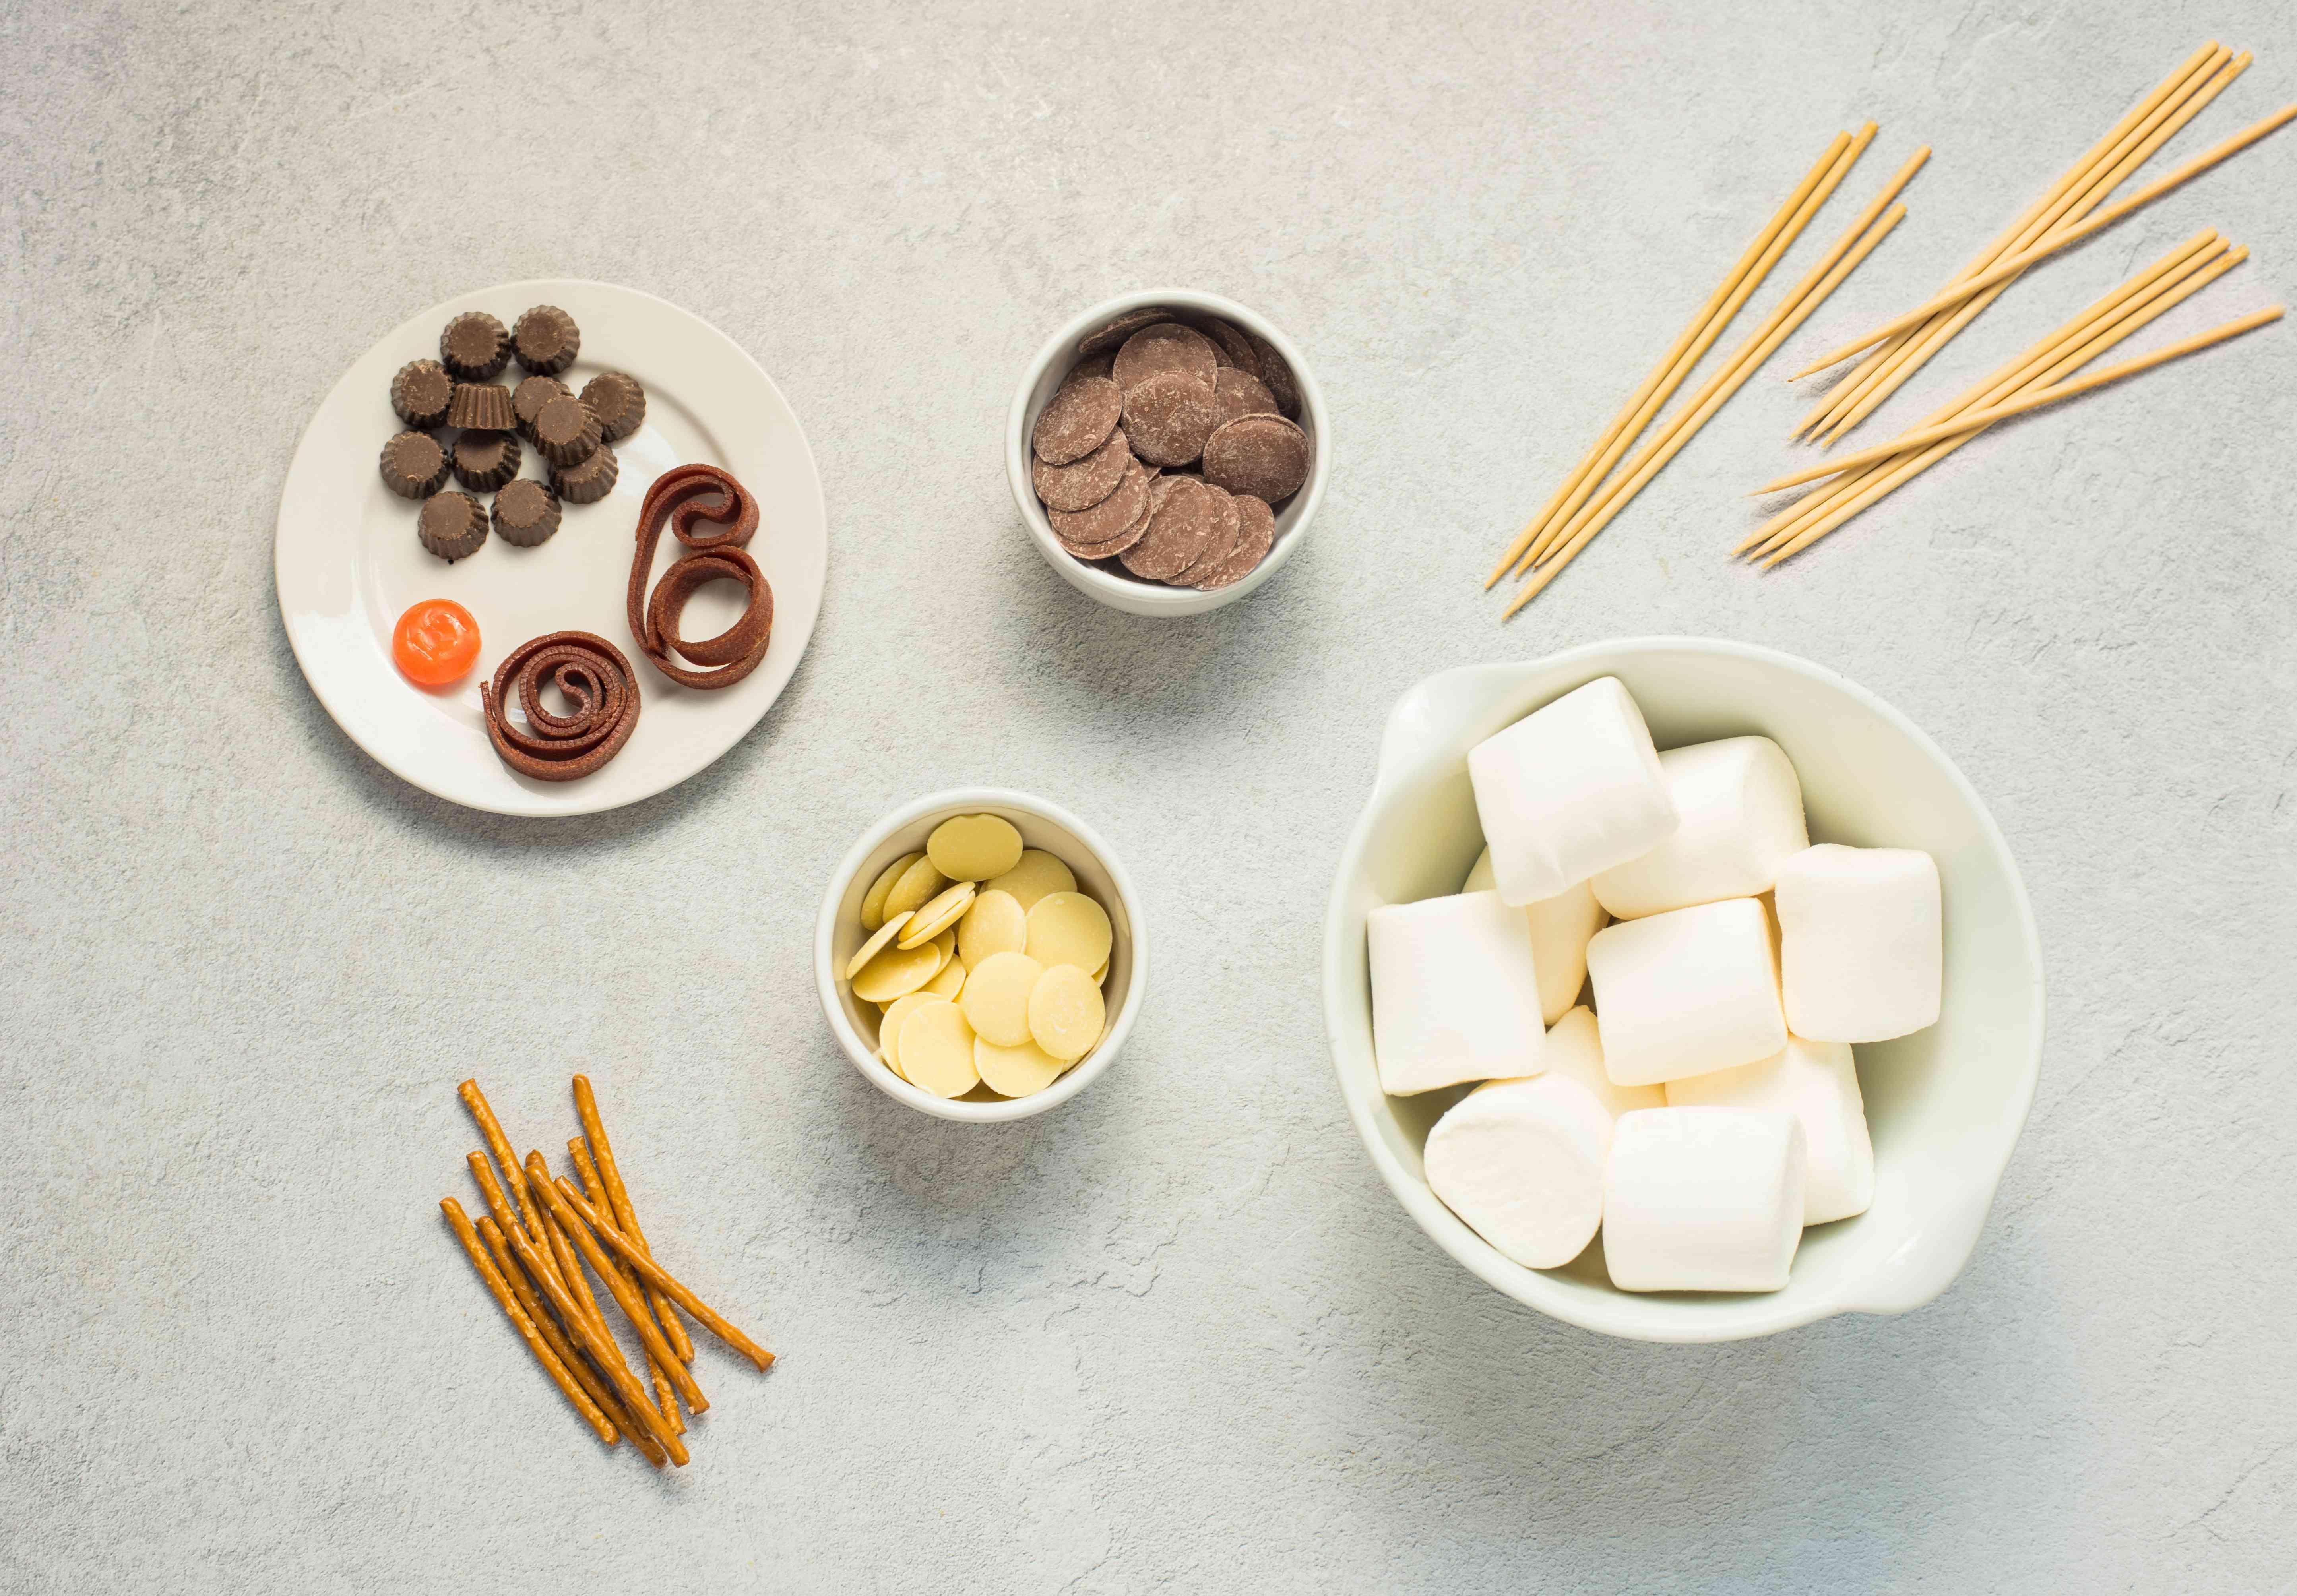 Ingredients for marshmallow snowmen